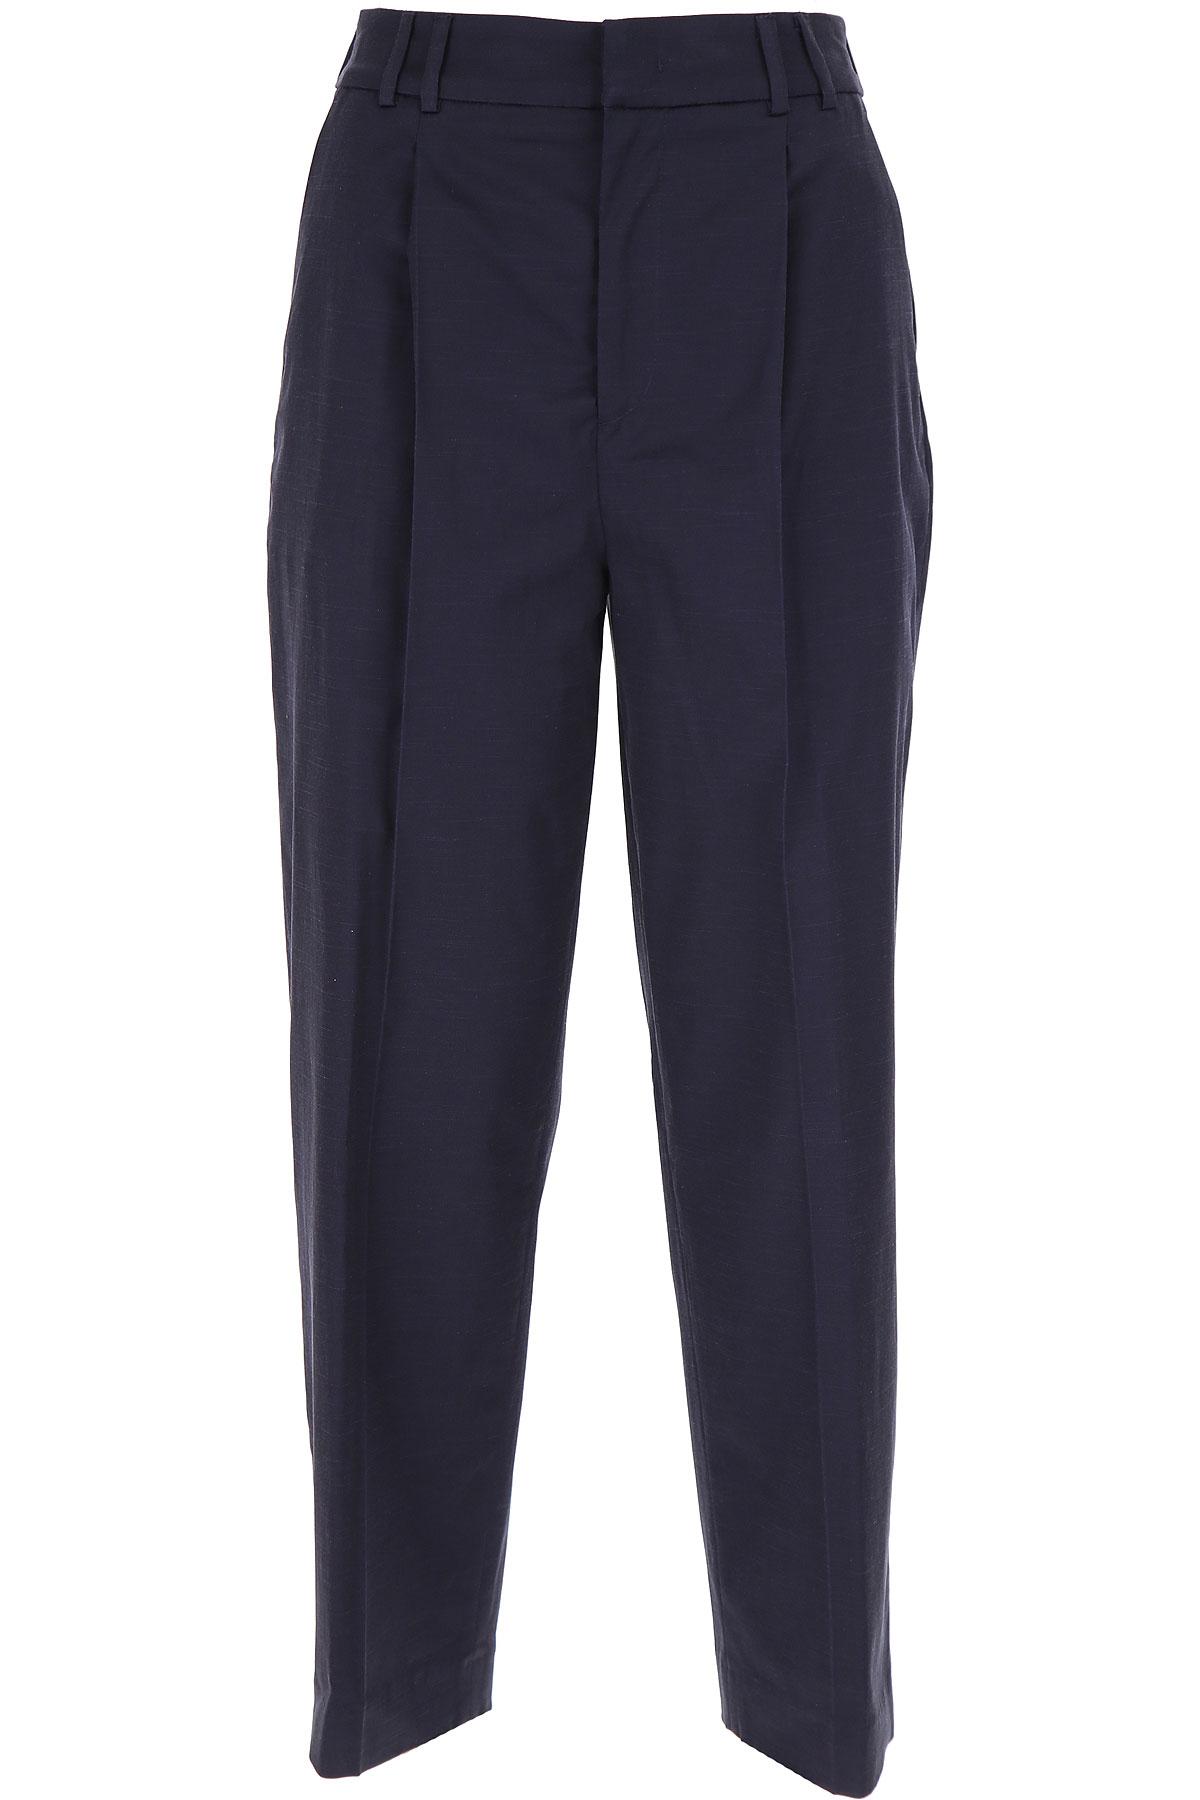 PT01 Pants for Women On Sale, Midnight Blue, Cotton, 2019, 26 28 30